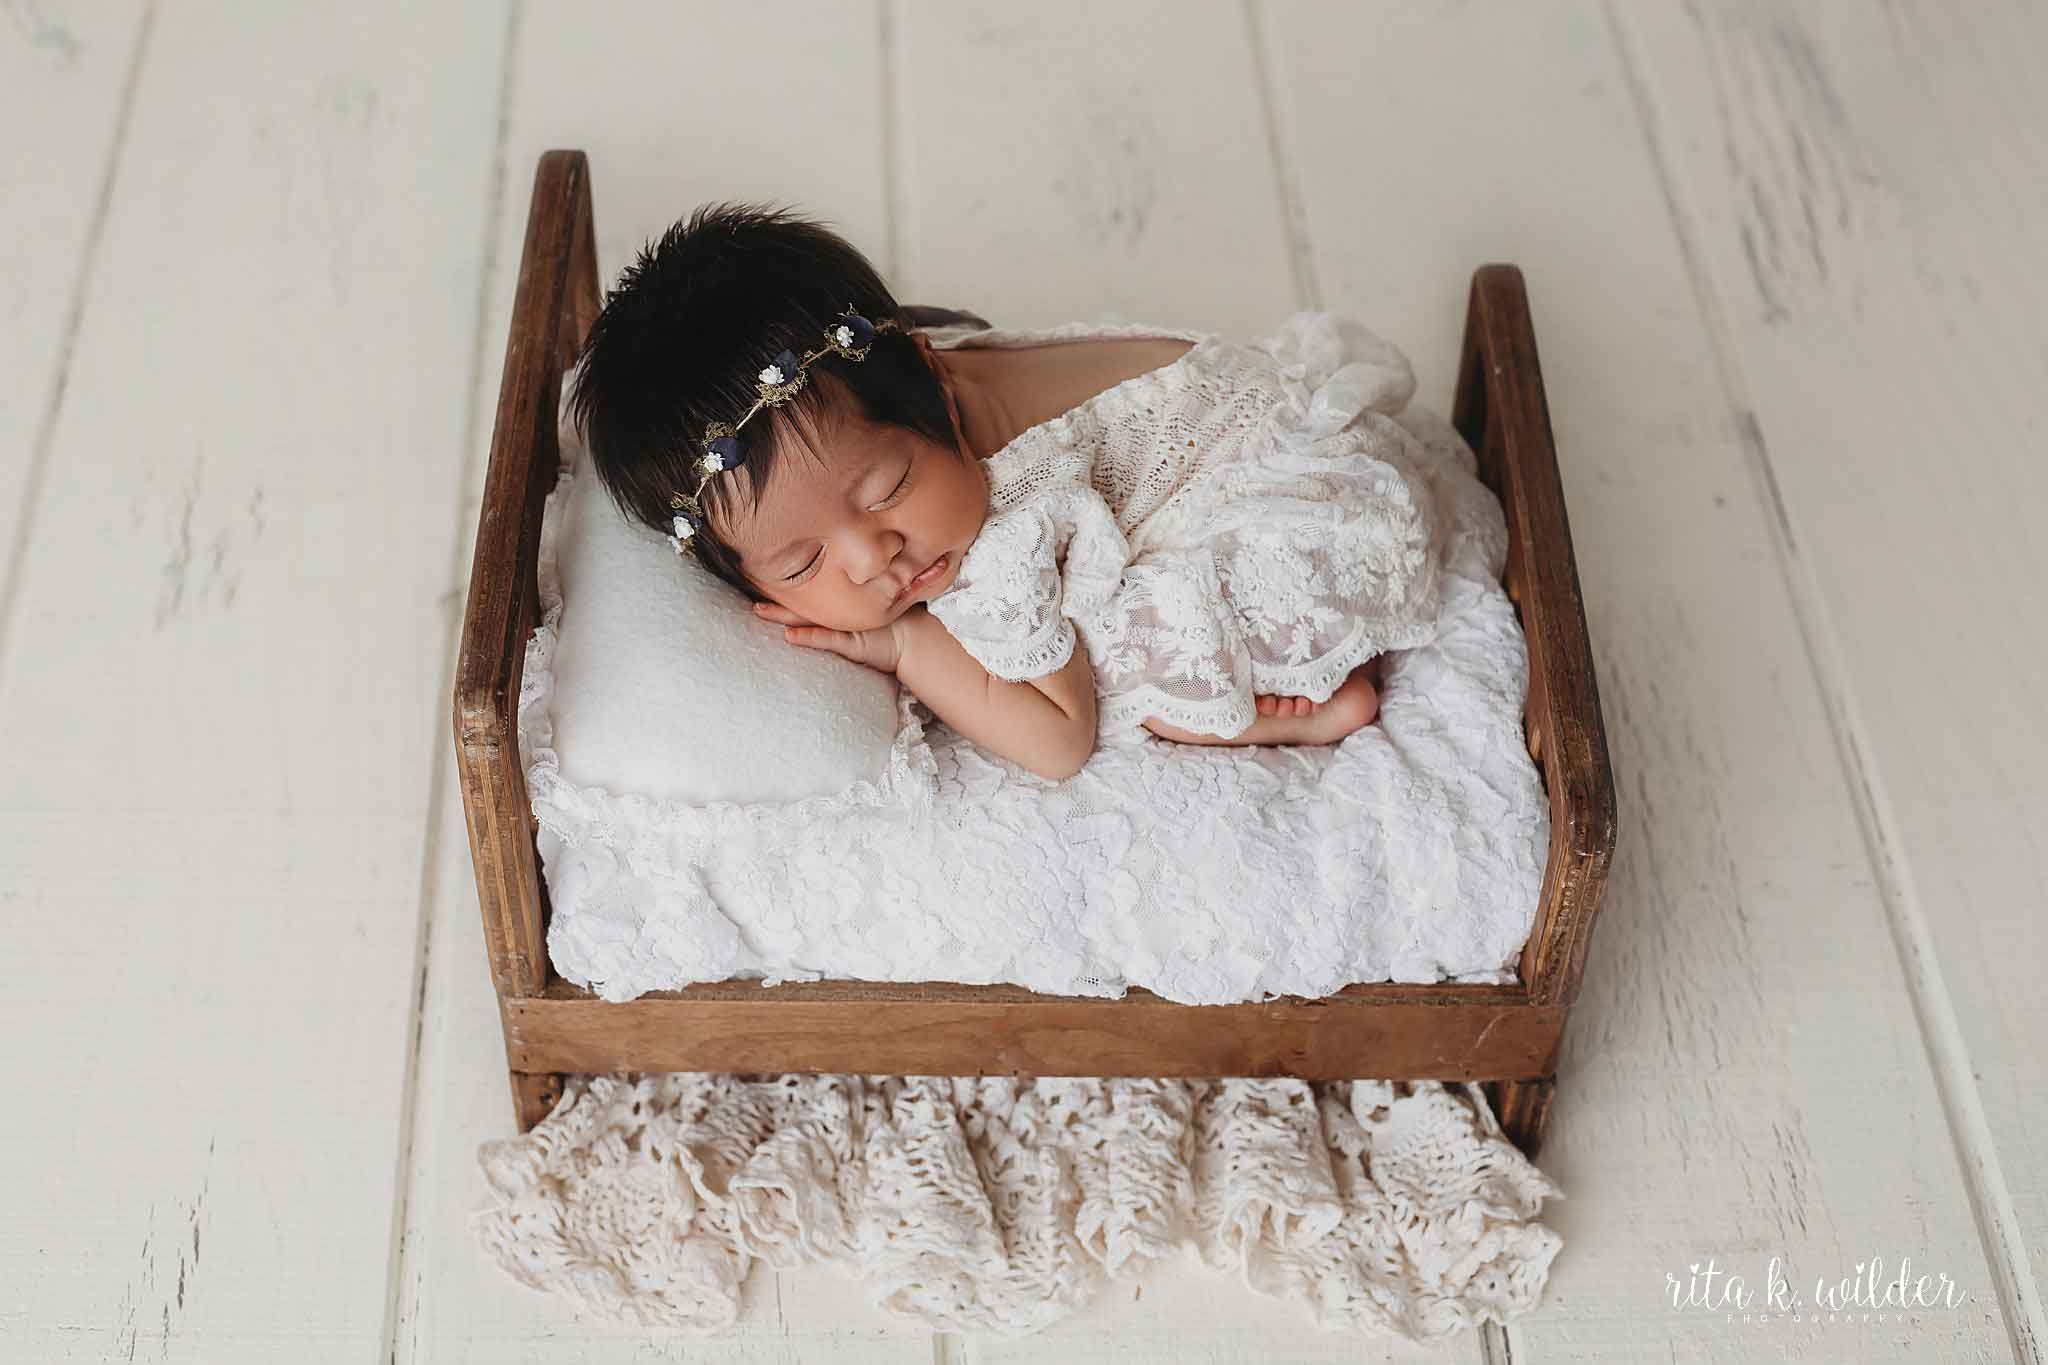 Baby Photographer Flower Mound